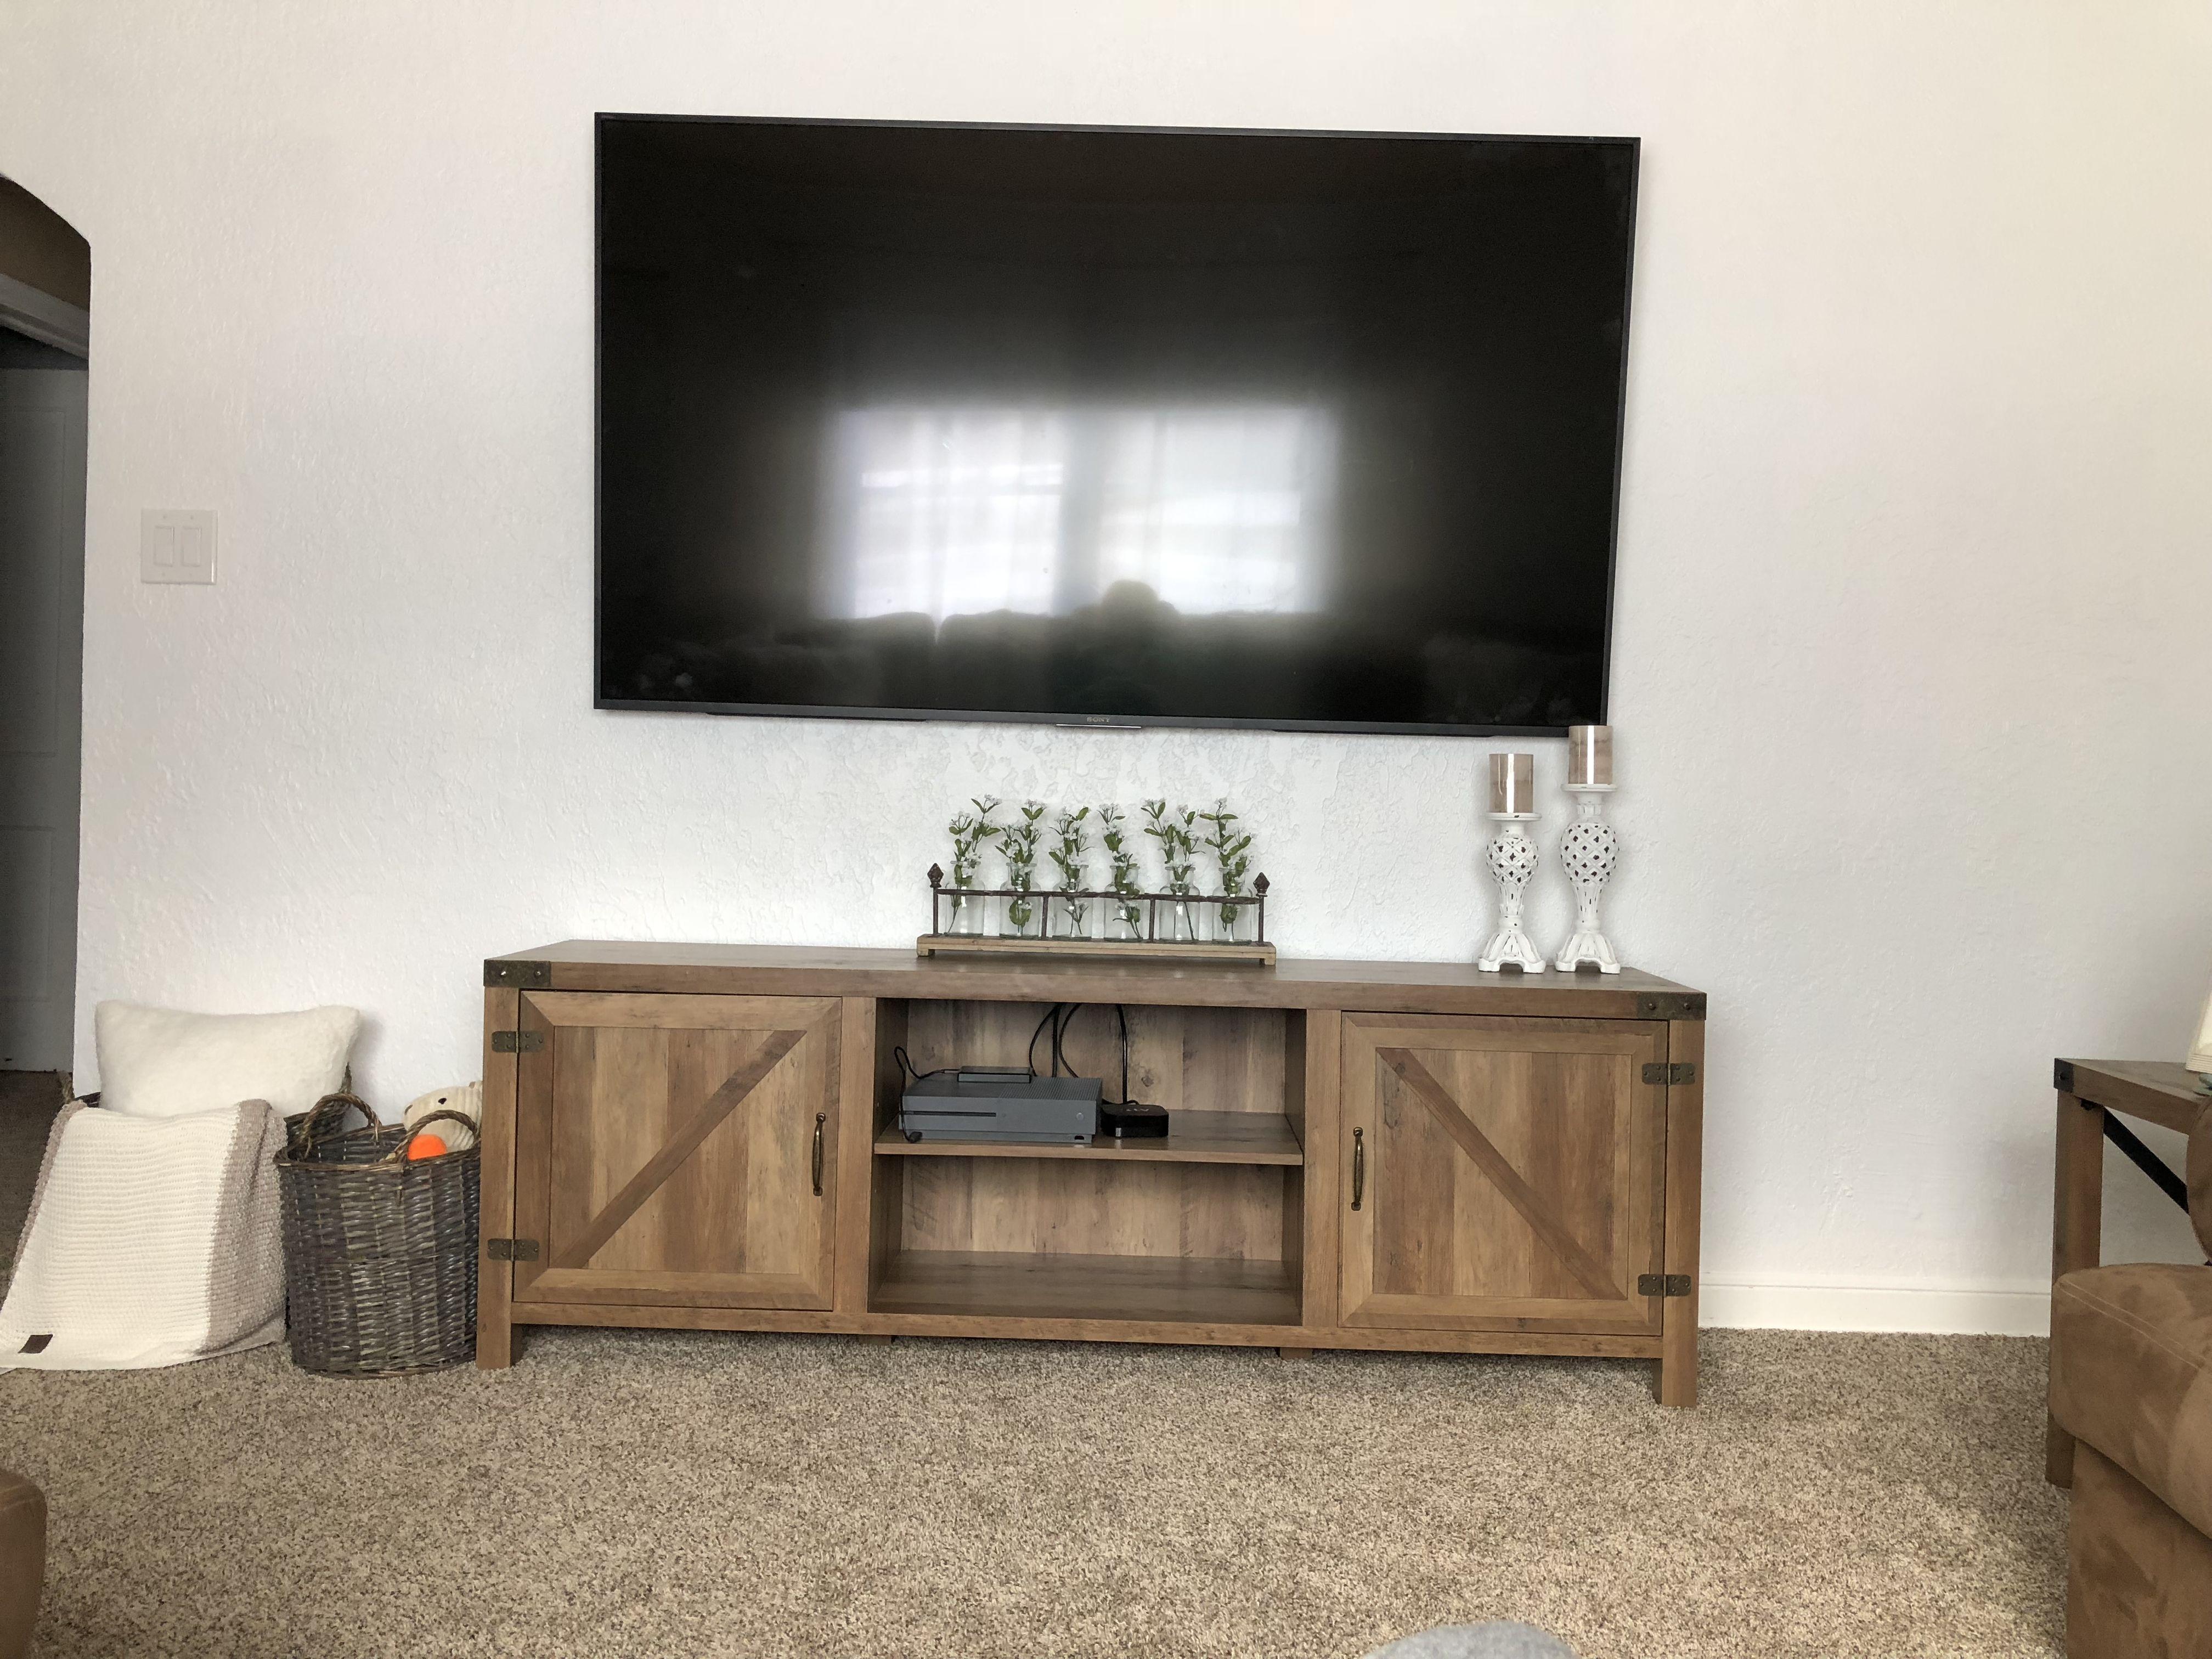 Farmhouse living room | Farm house living room, Tv stand ...